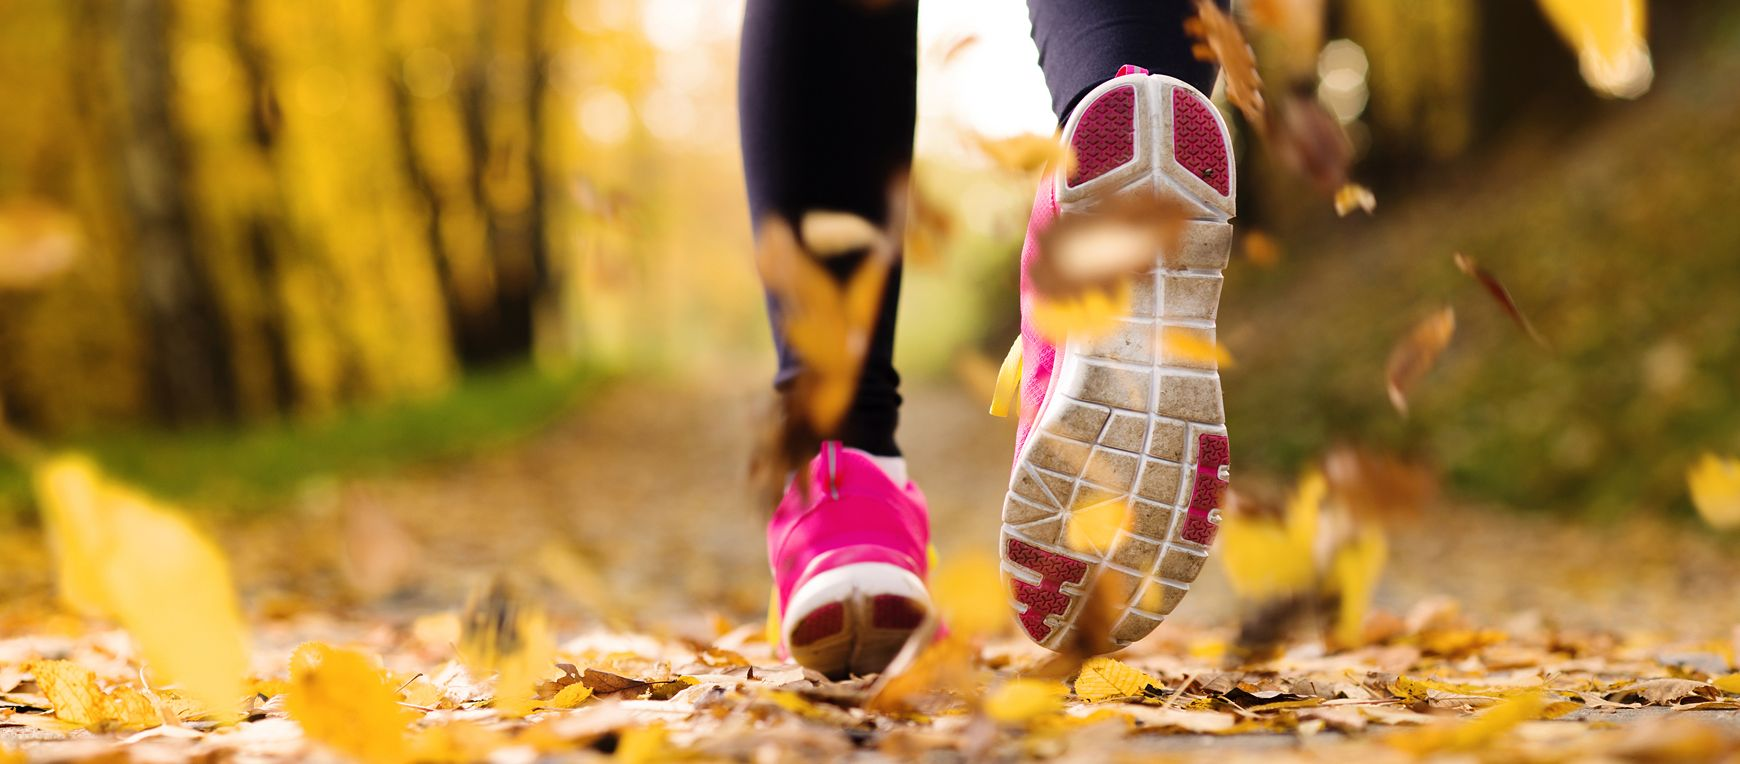 Emerald Mountain Trail Run is September 25